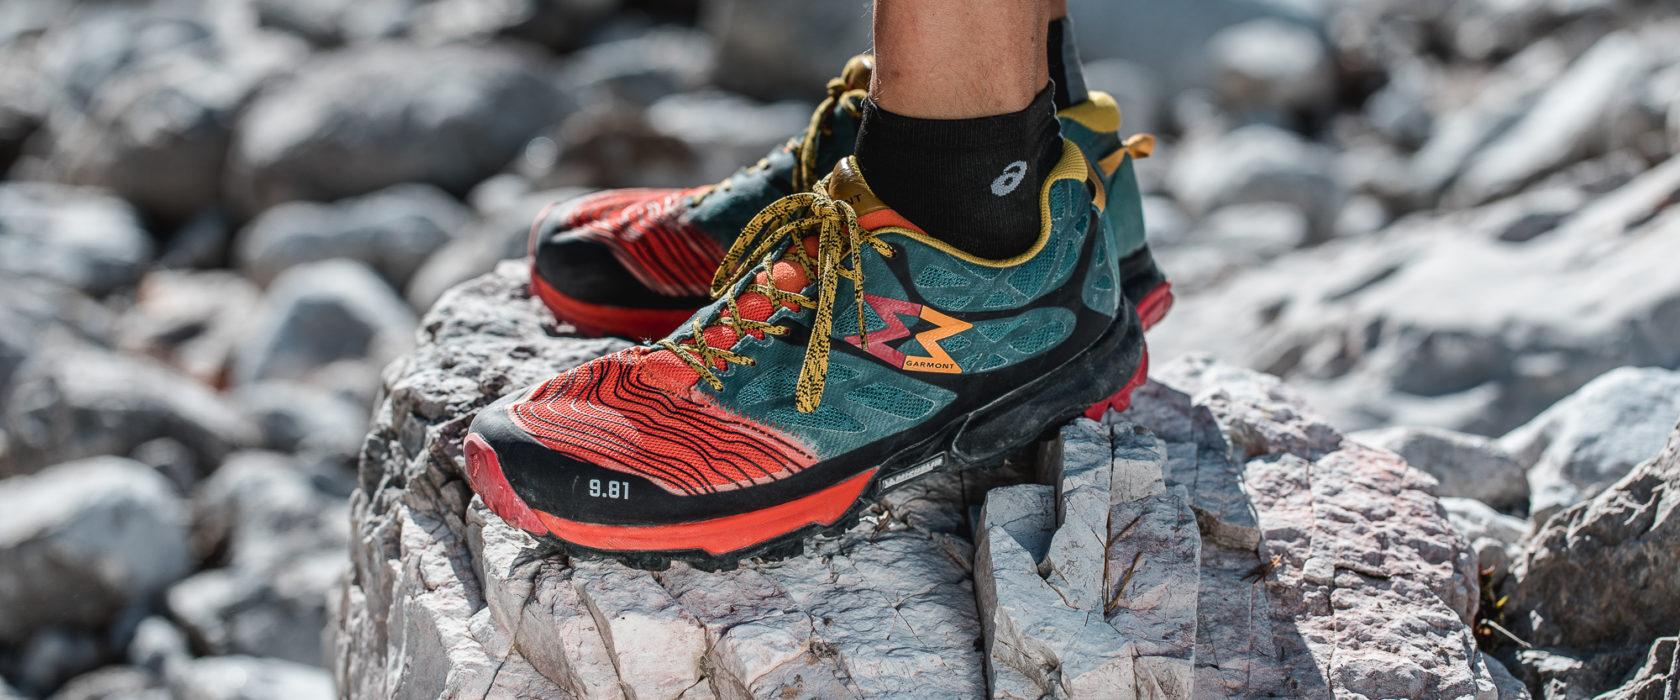 garmont-trailrunning